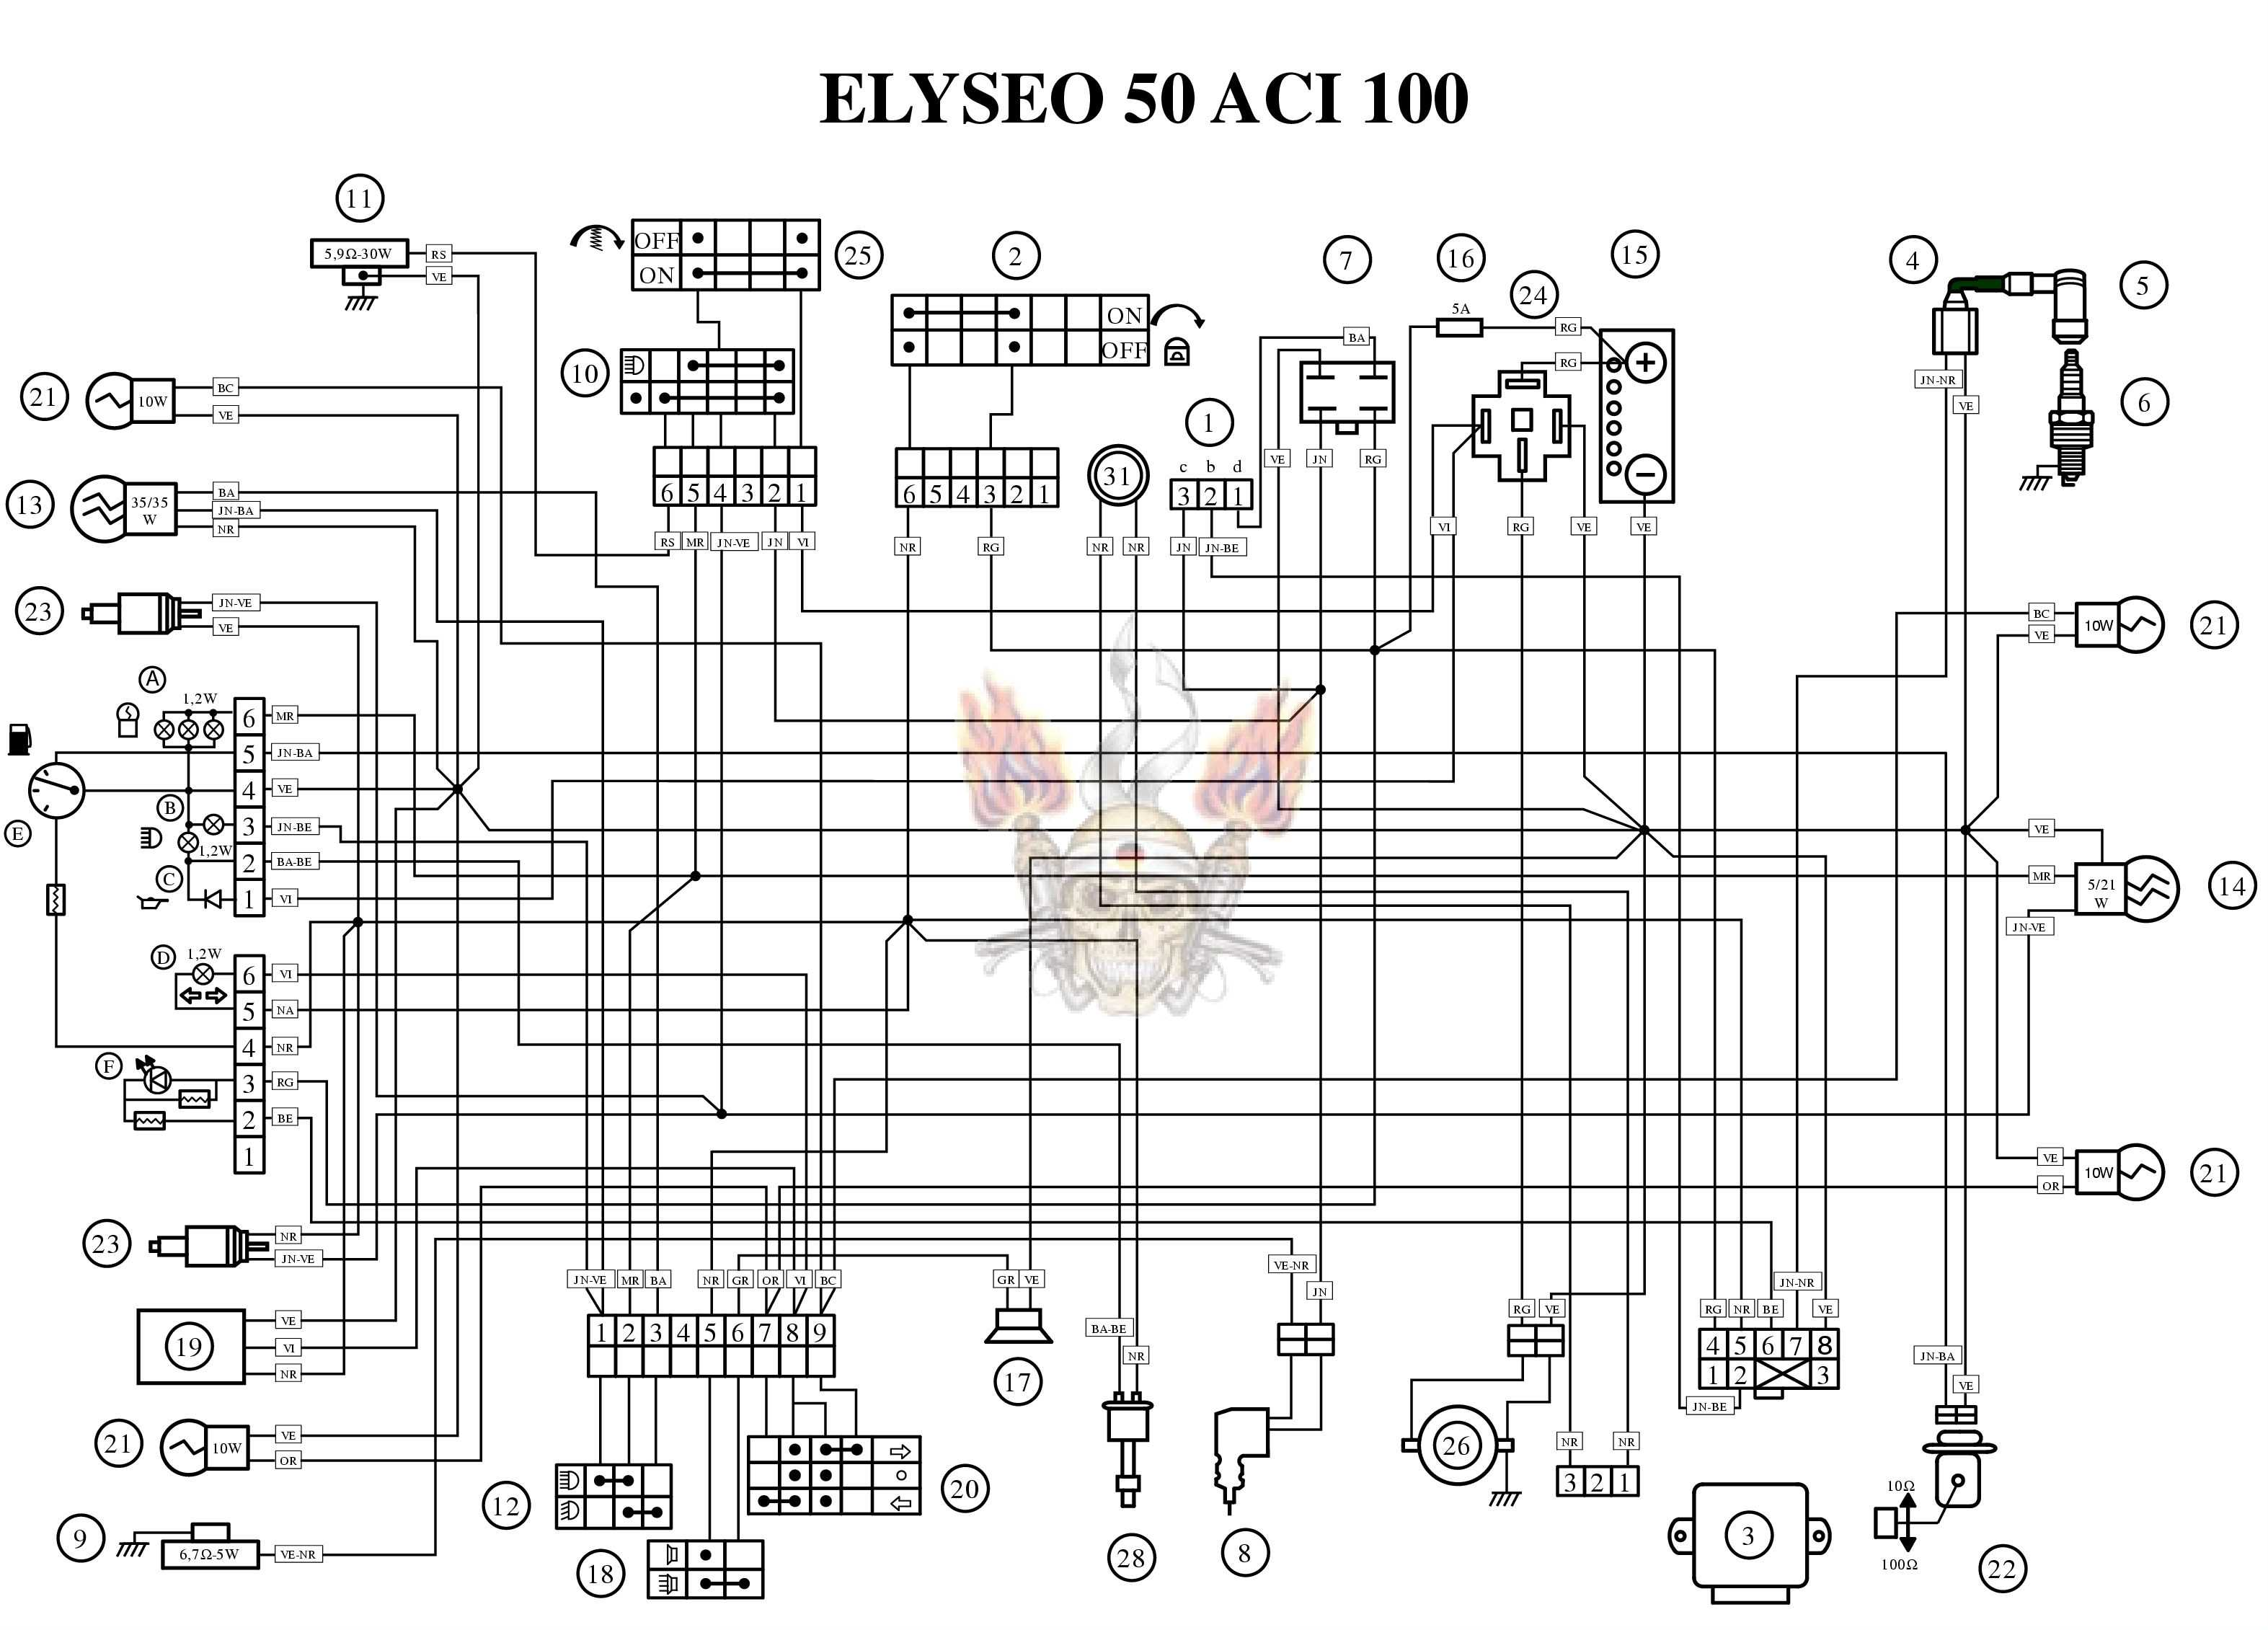 fiat scudo 2007 wiring diagram  fiat 500 pop diagram  fiat